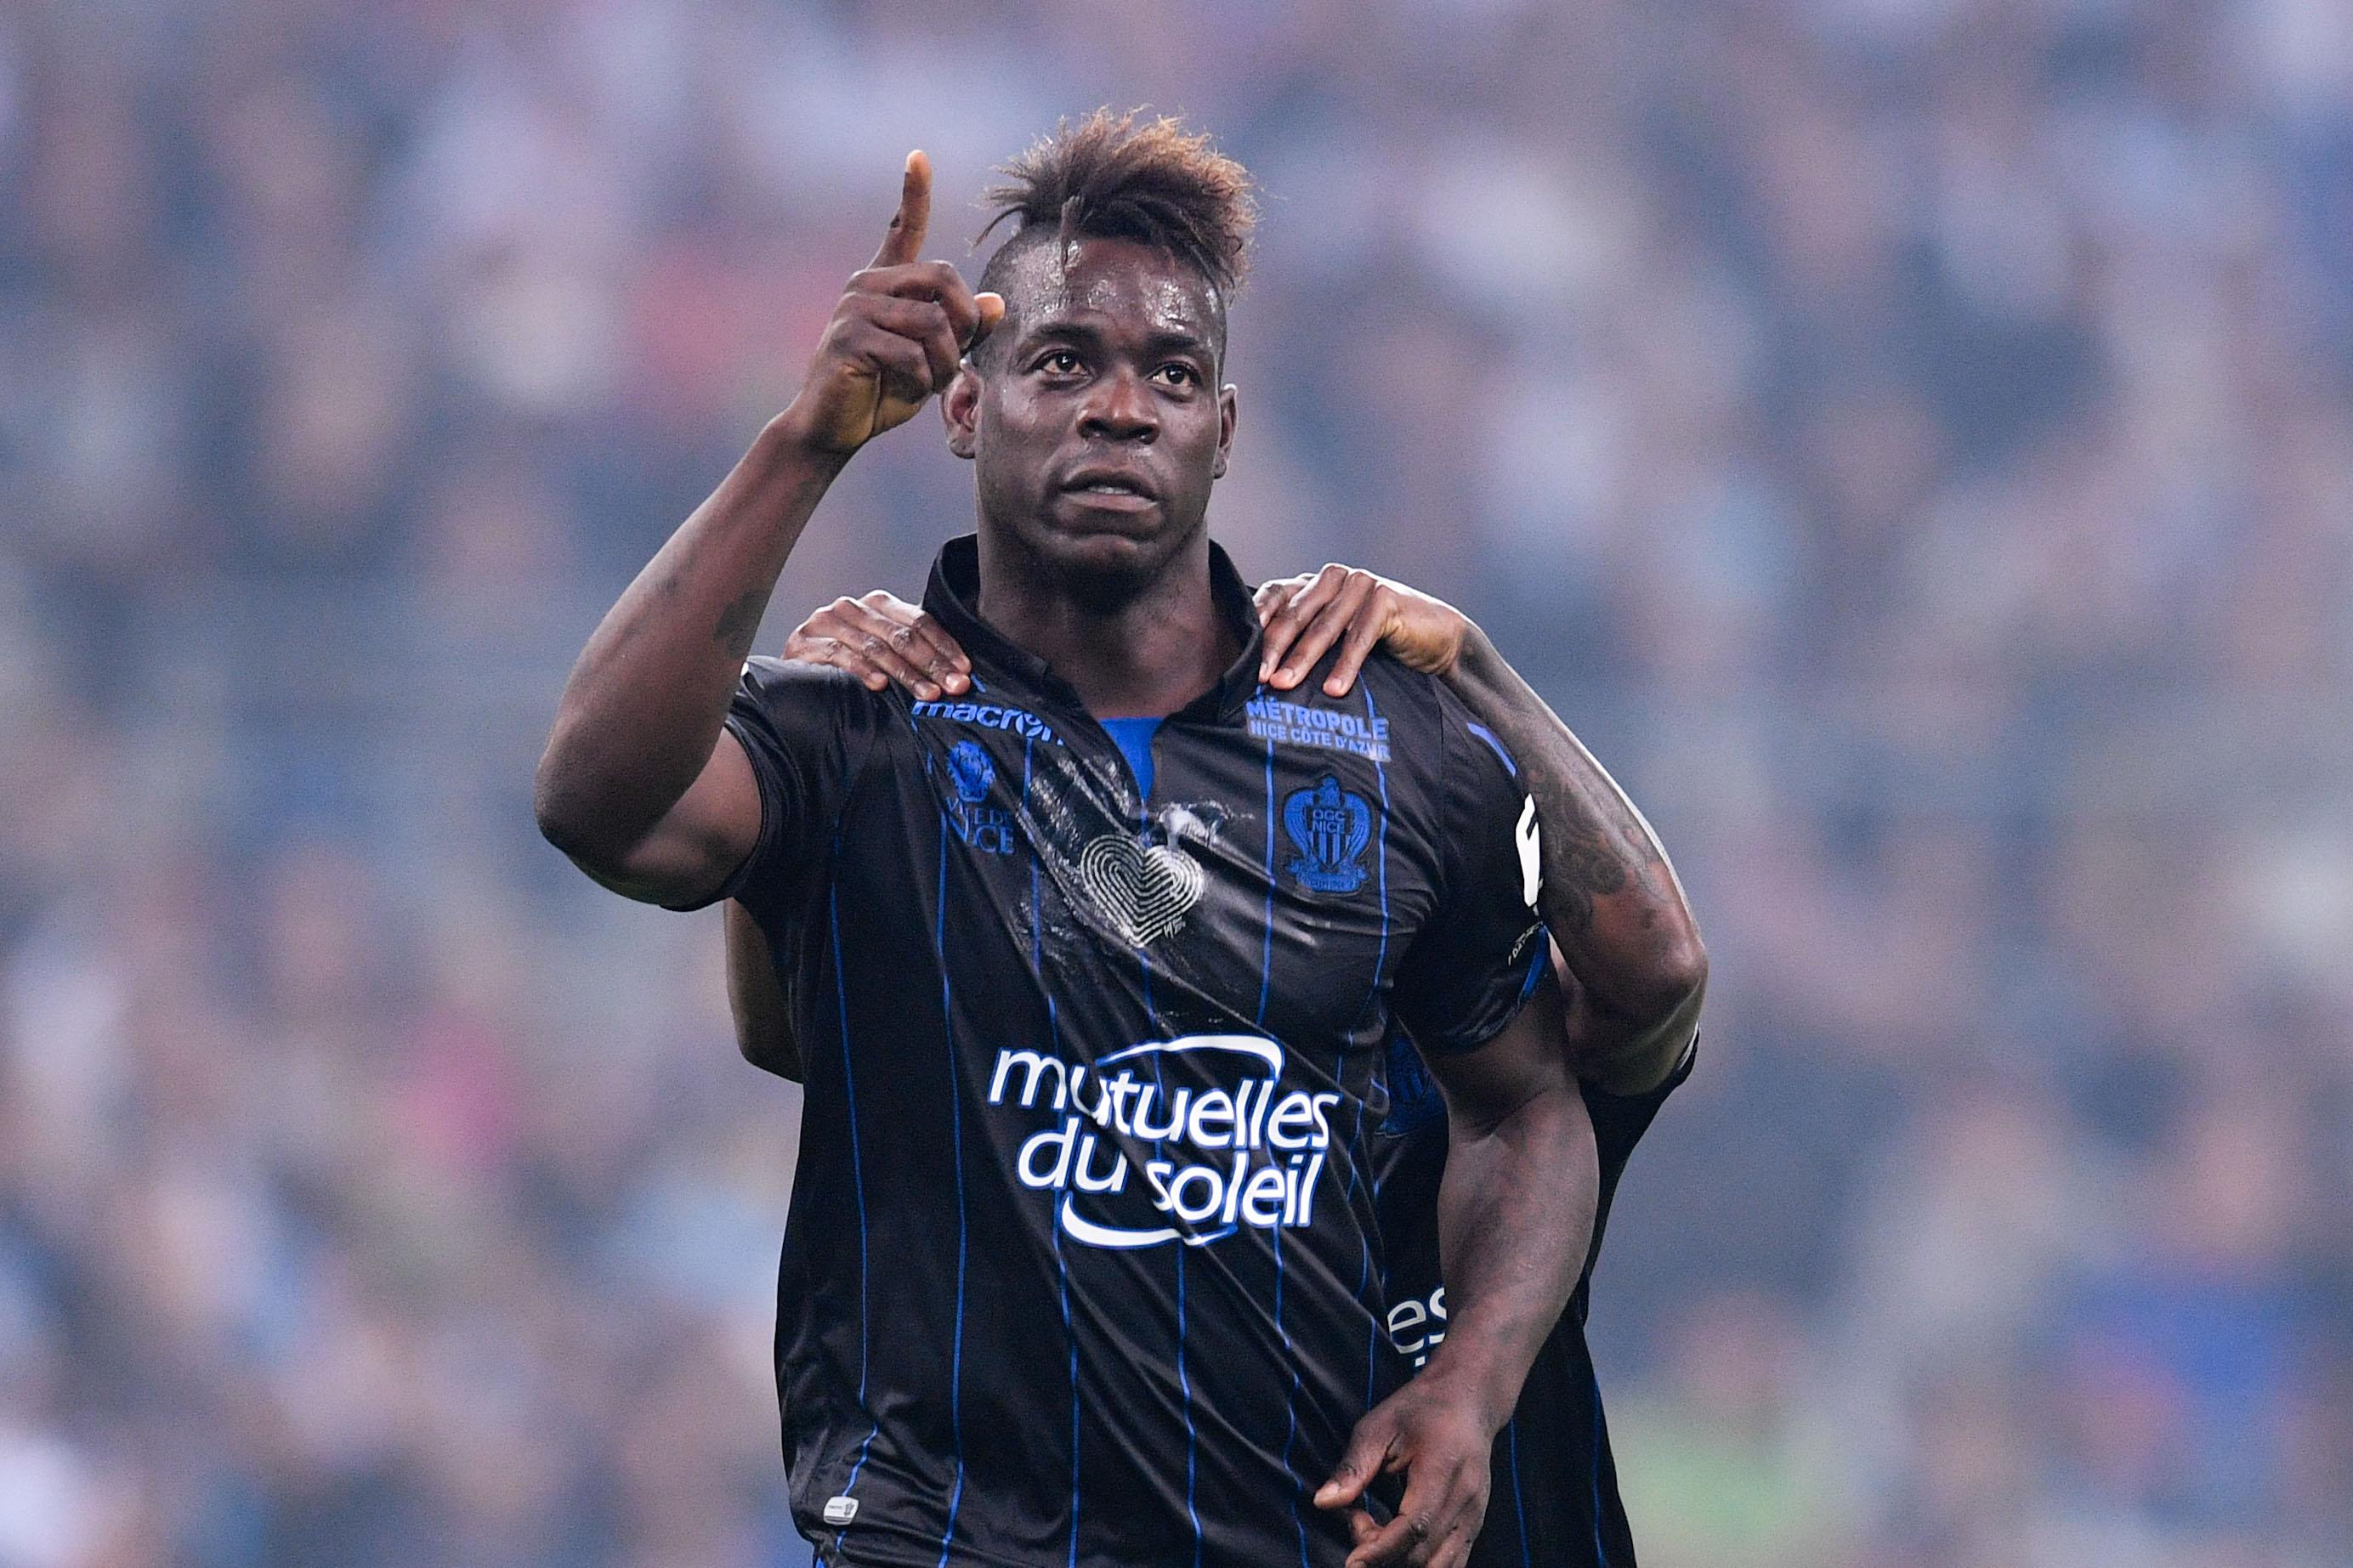 Football - Transferts - Courtisé par l'OM, Mario Balotelli reste à Nice